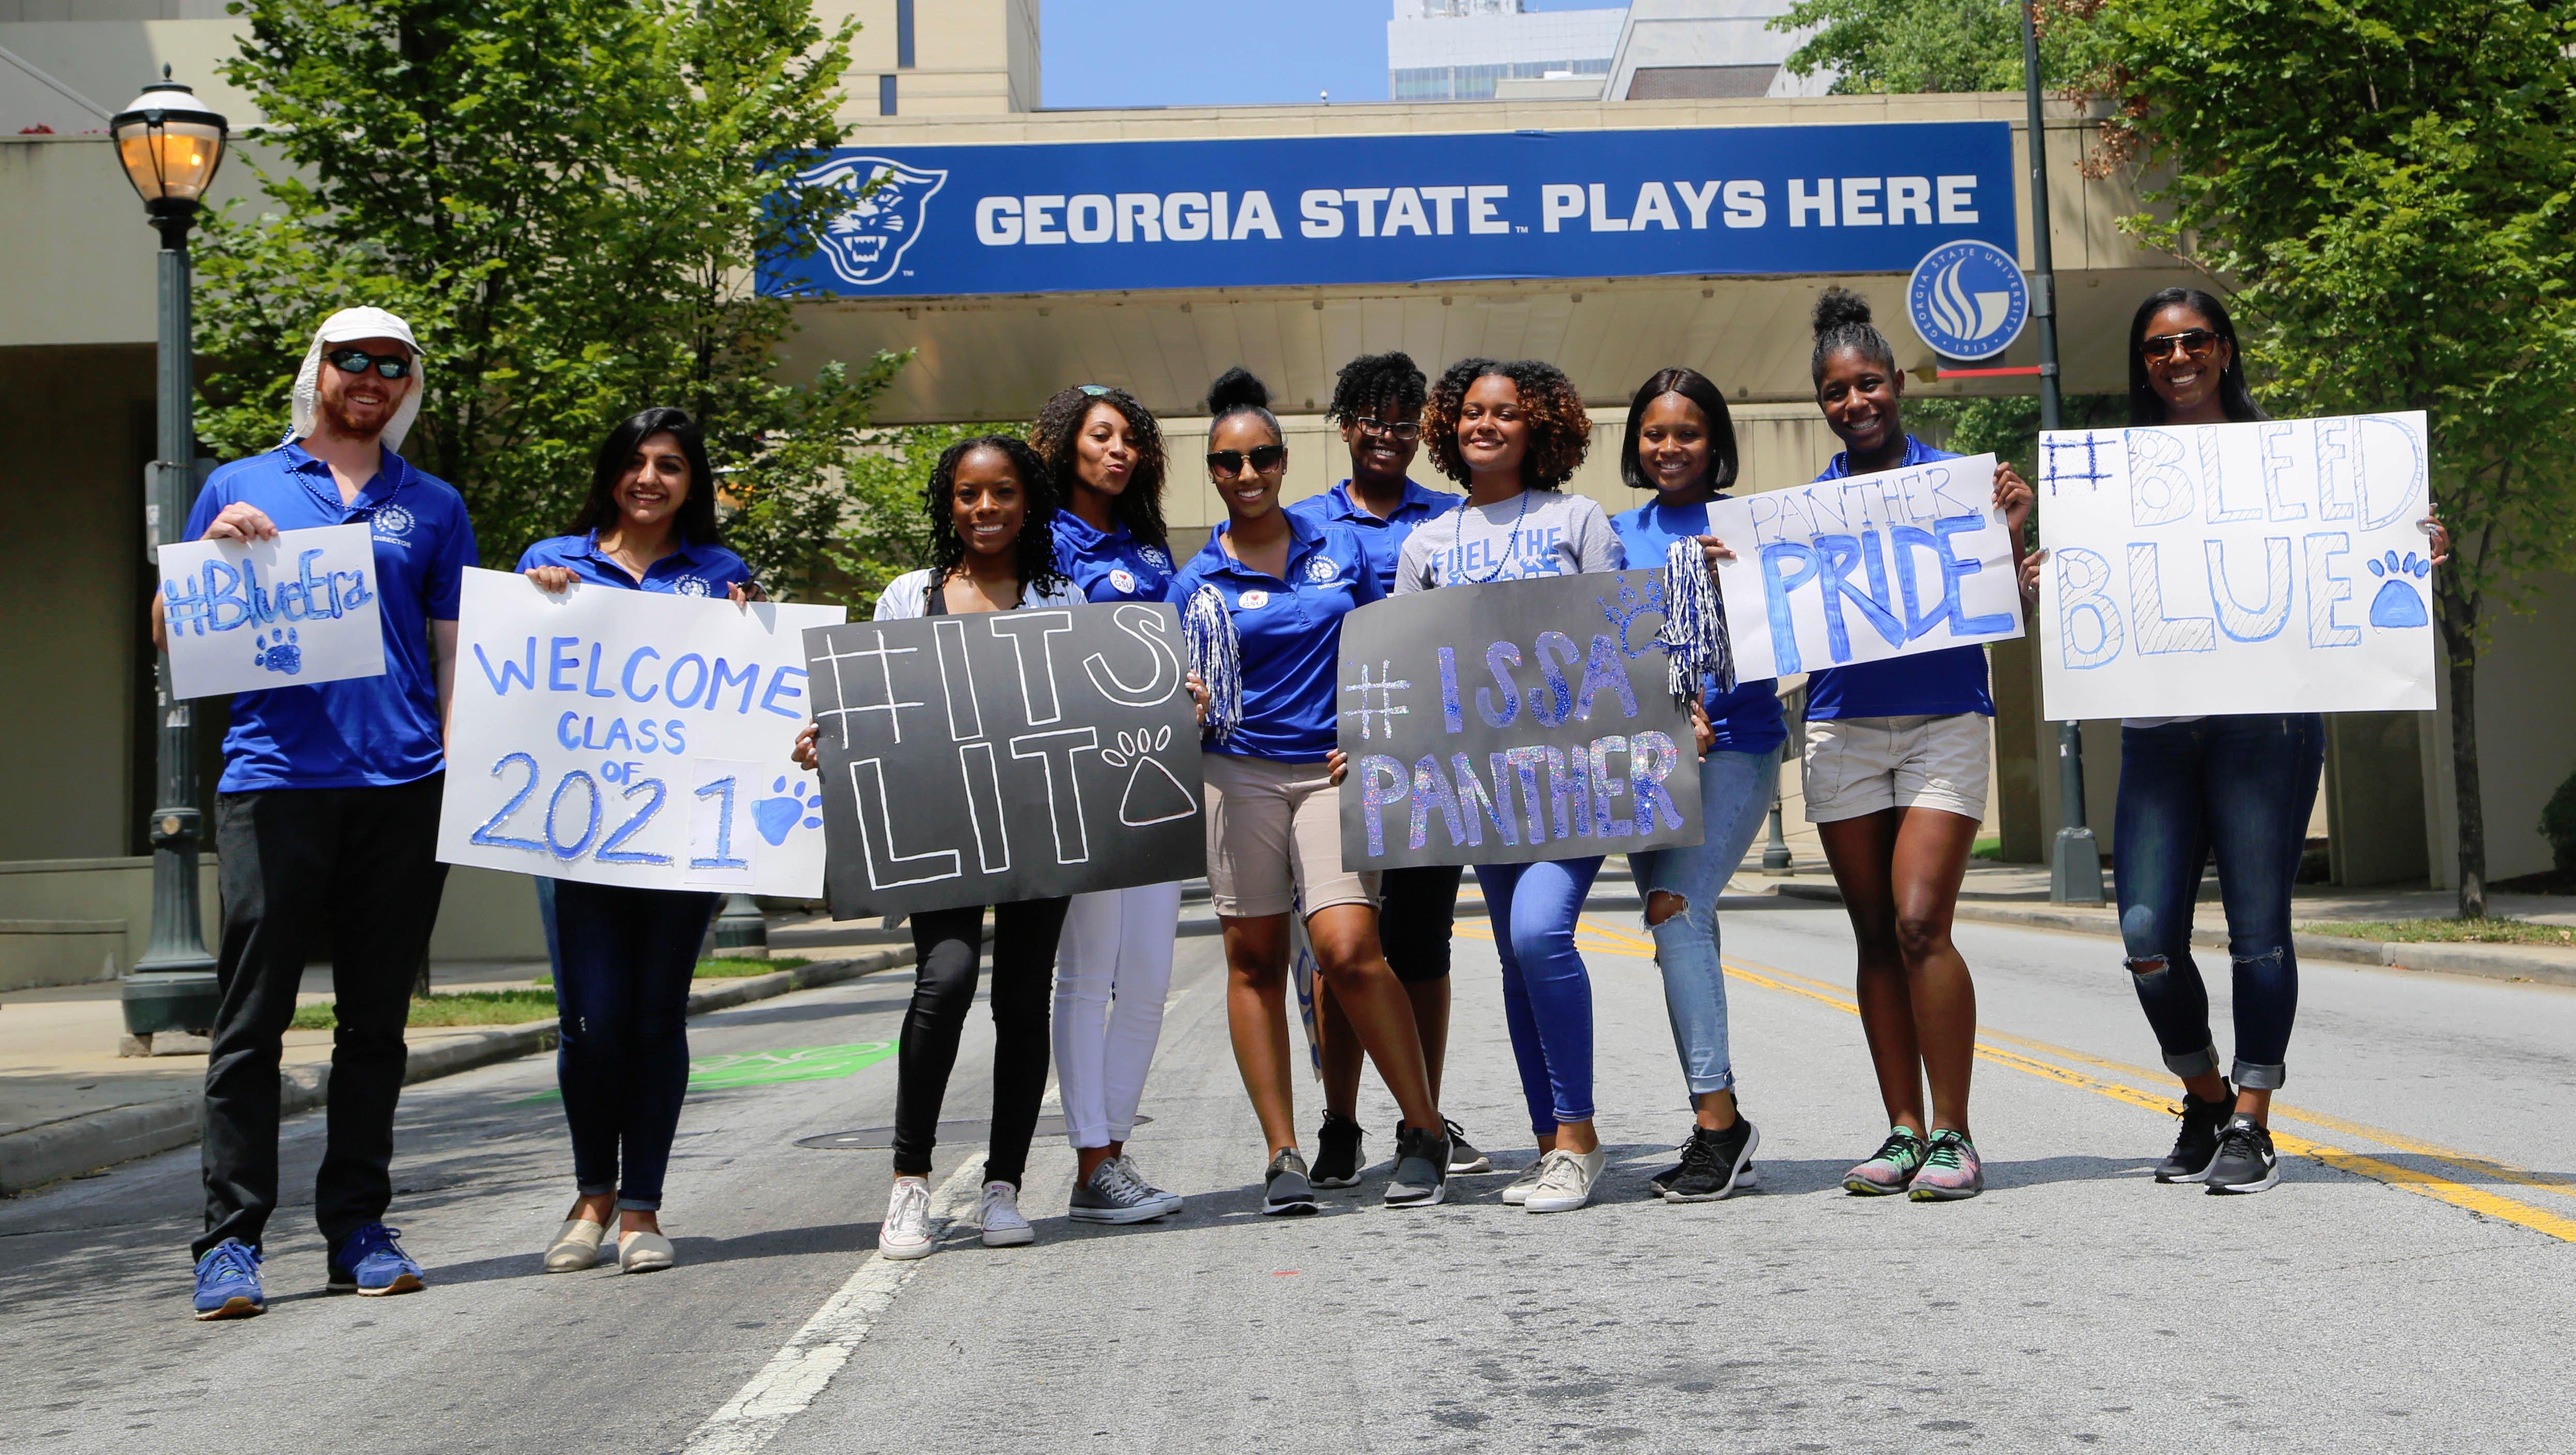 Gsu Alumni Association – Student Alumni Association In Ga State University Calendar 2021